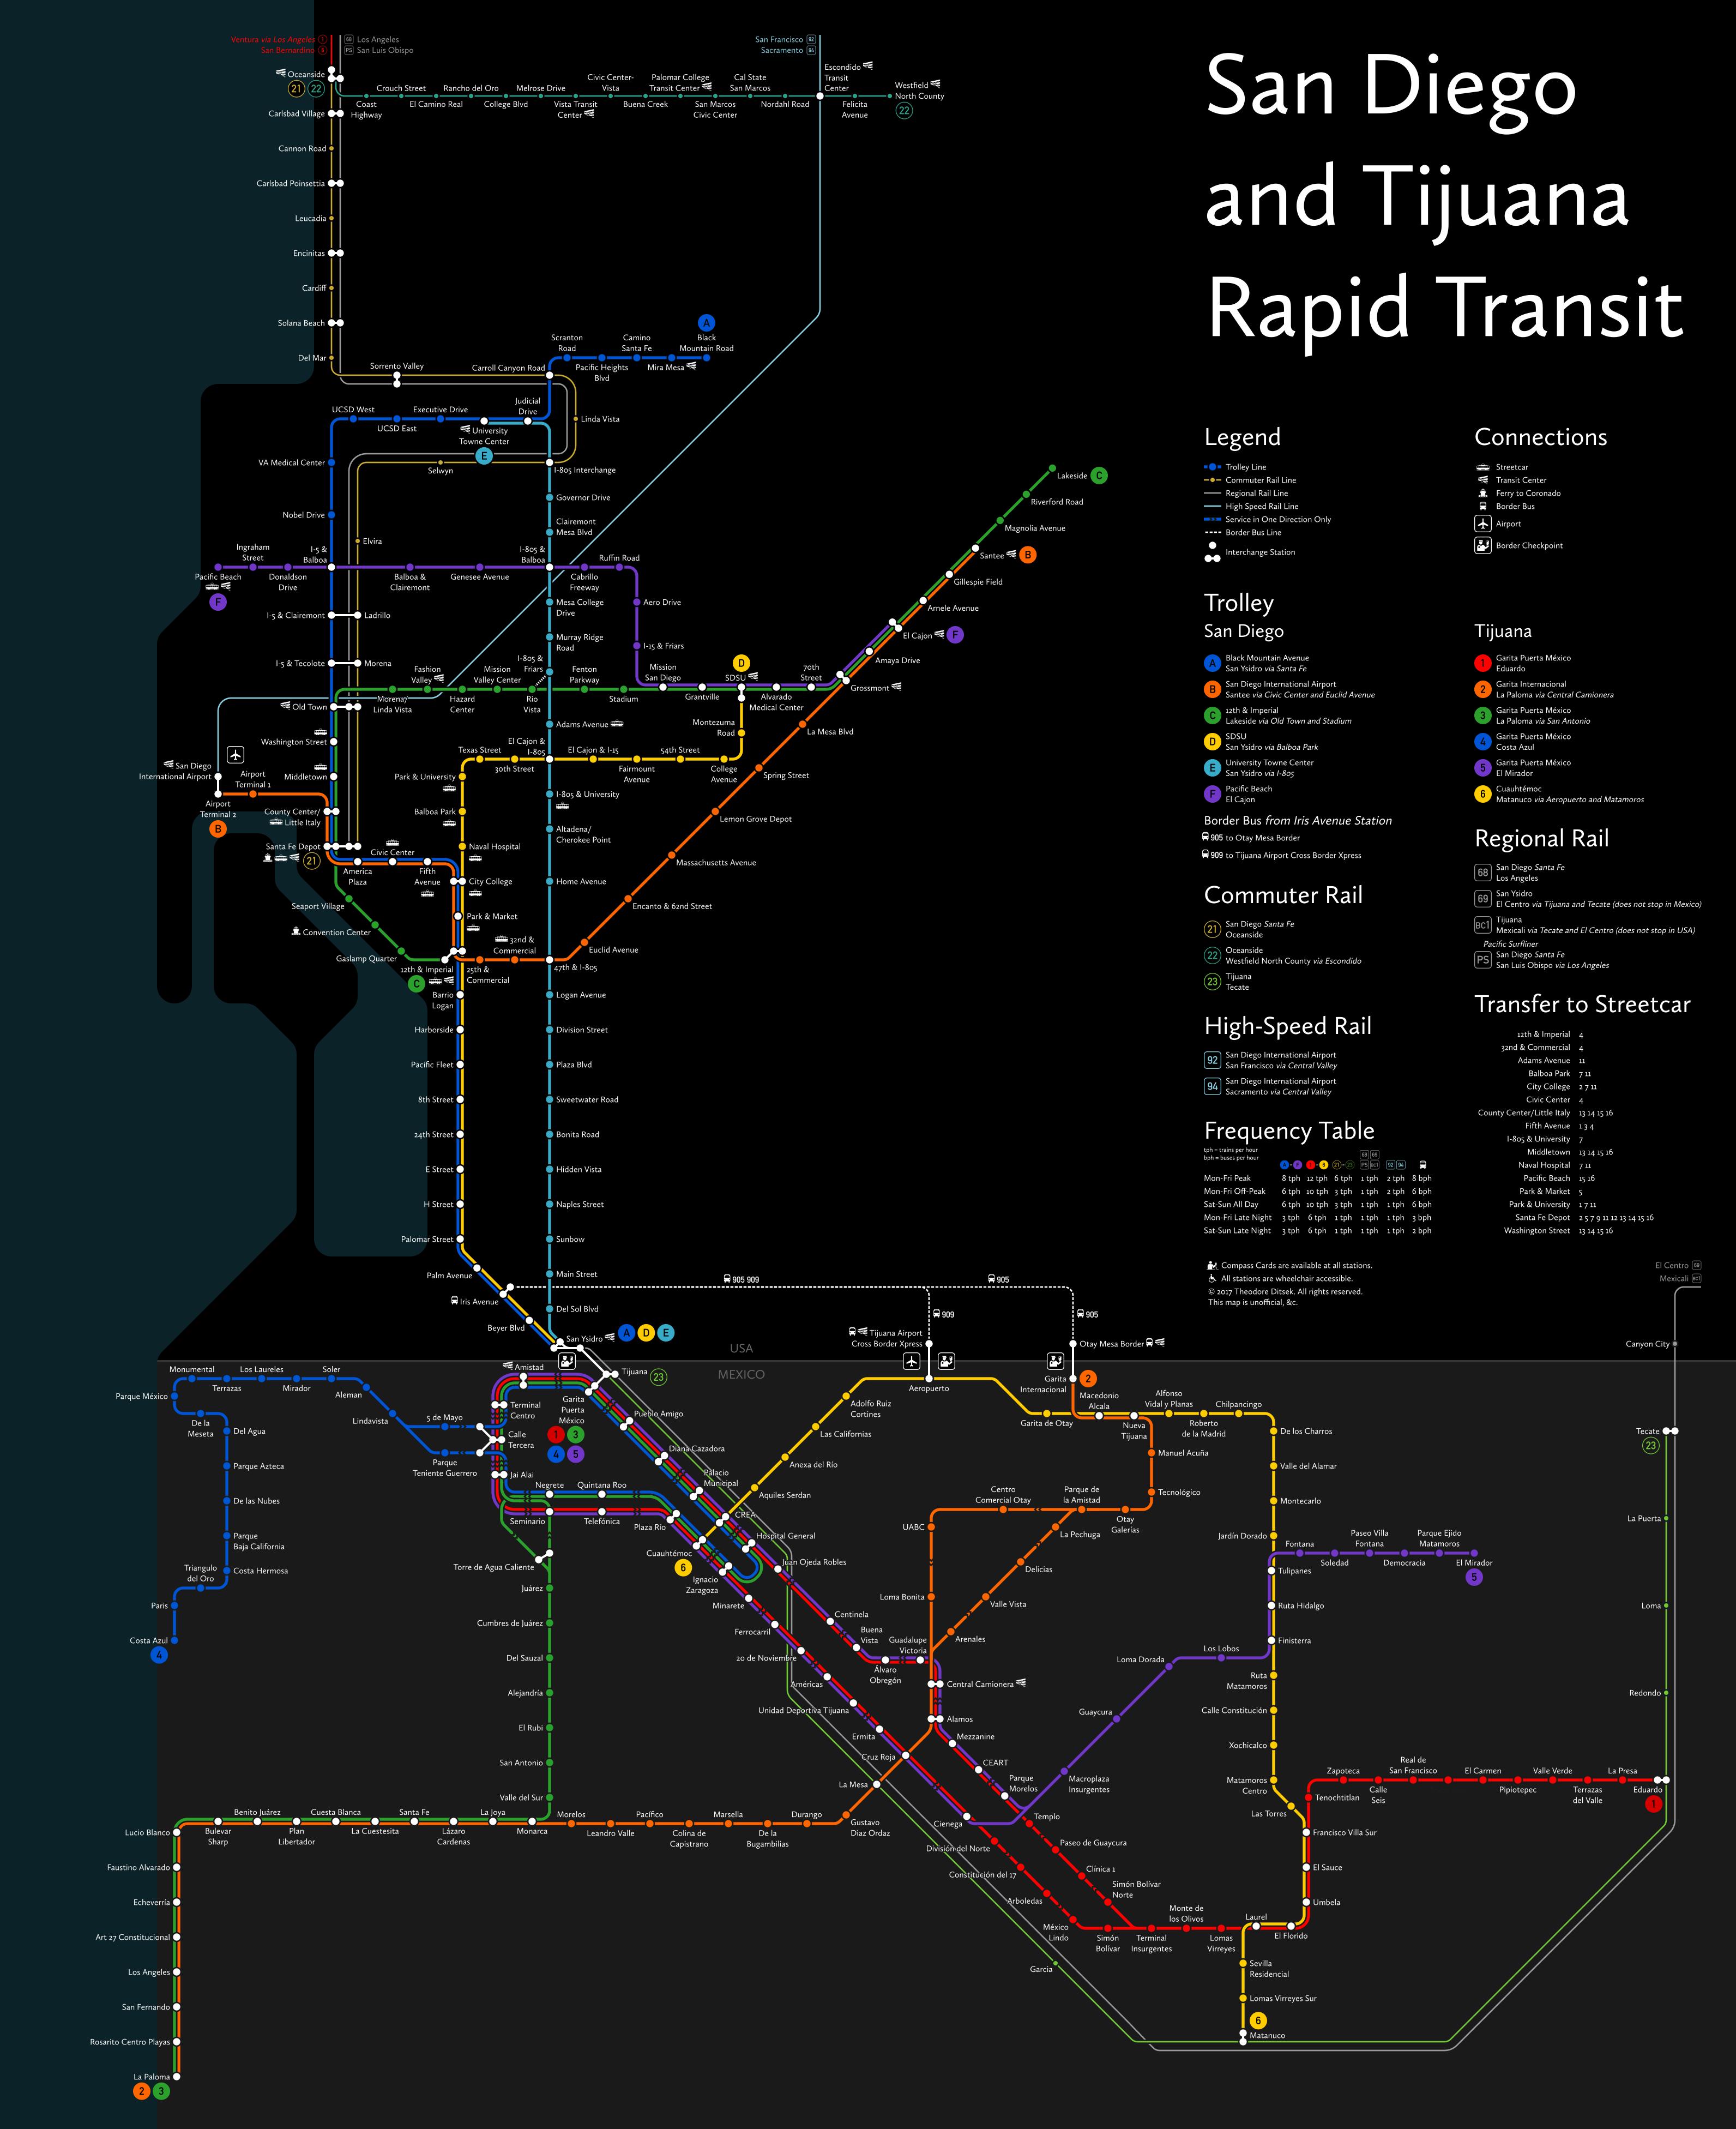 Trolley San Diego Map.San Diego Tijuana Crayon Map Theodore Ditsek